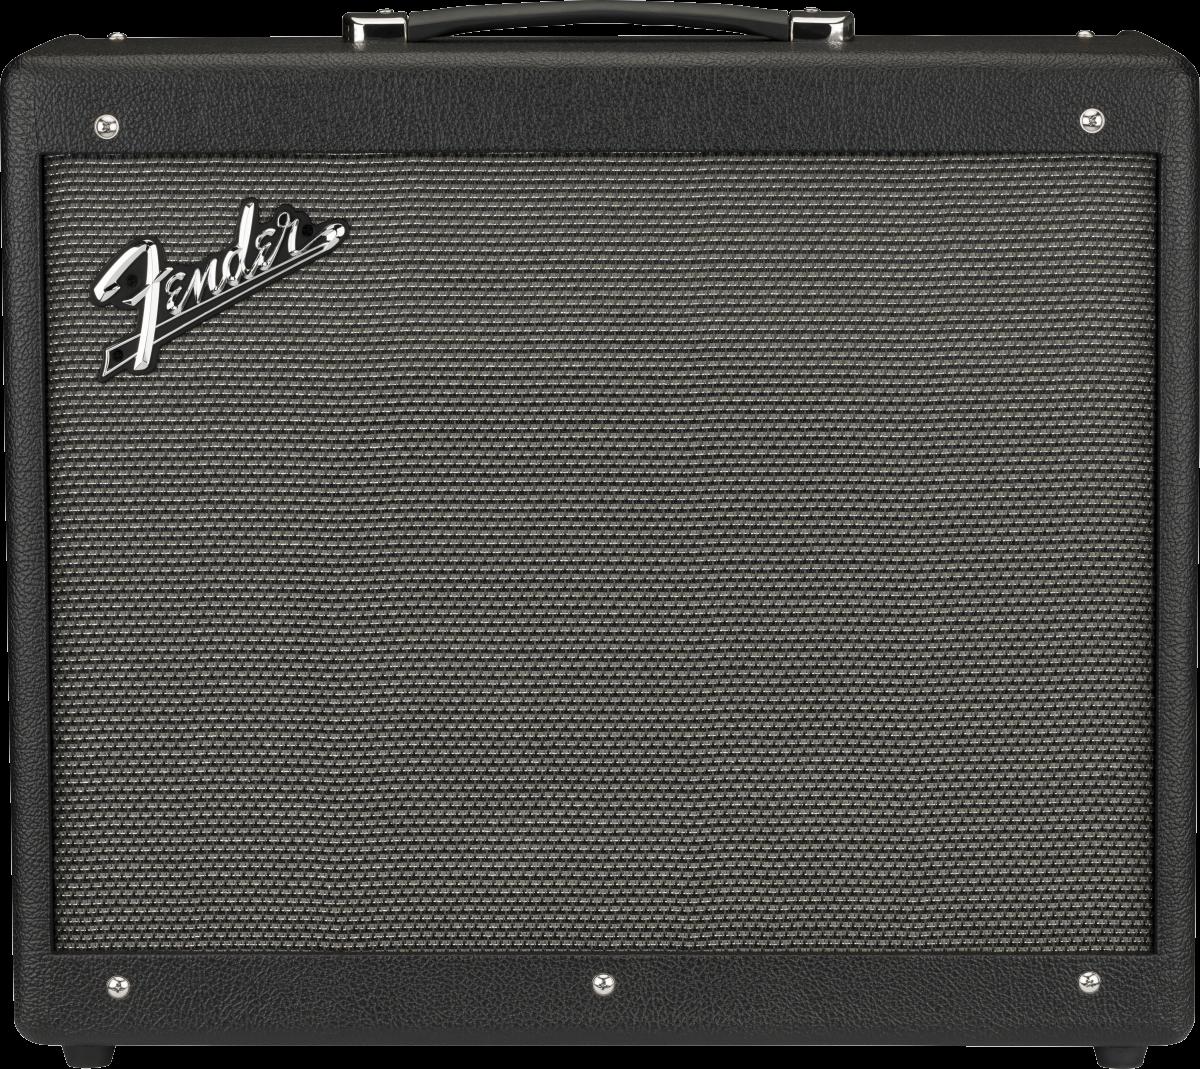 Fender Mustang GTX 100 1x12 100-watt Combo Amp